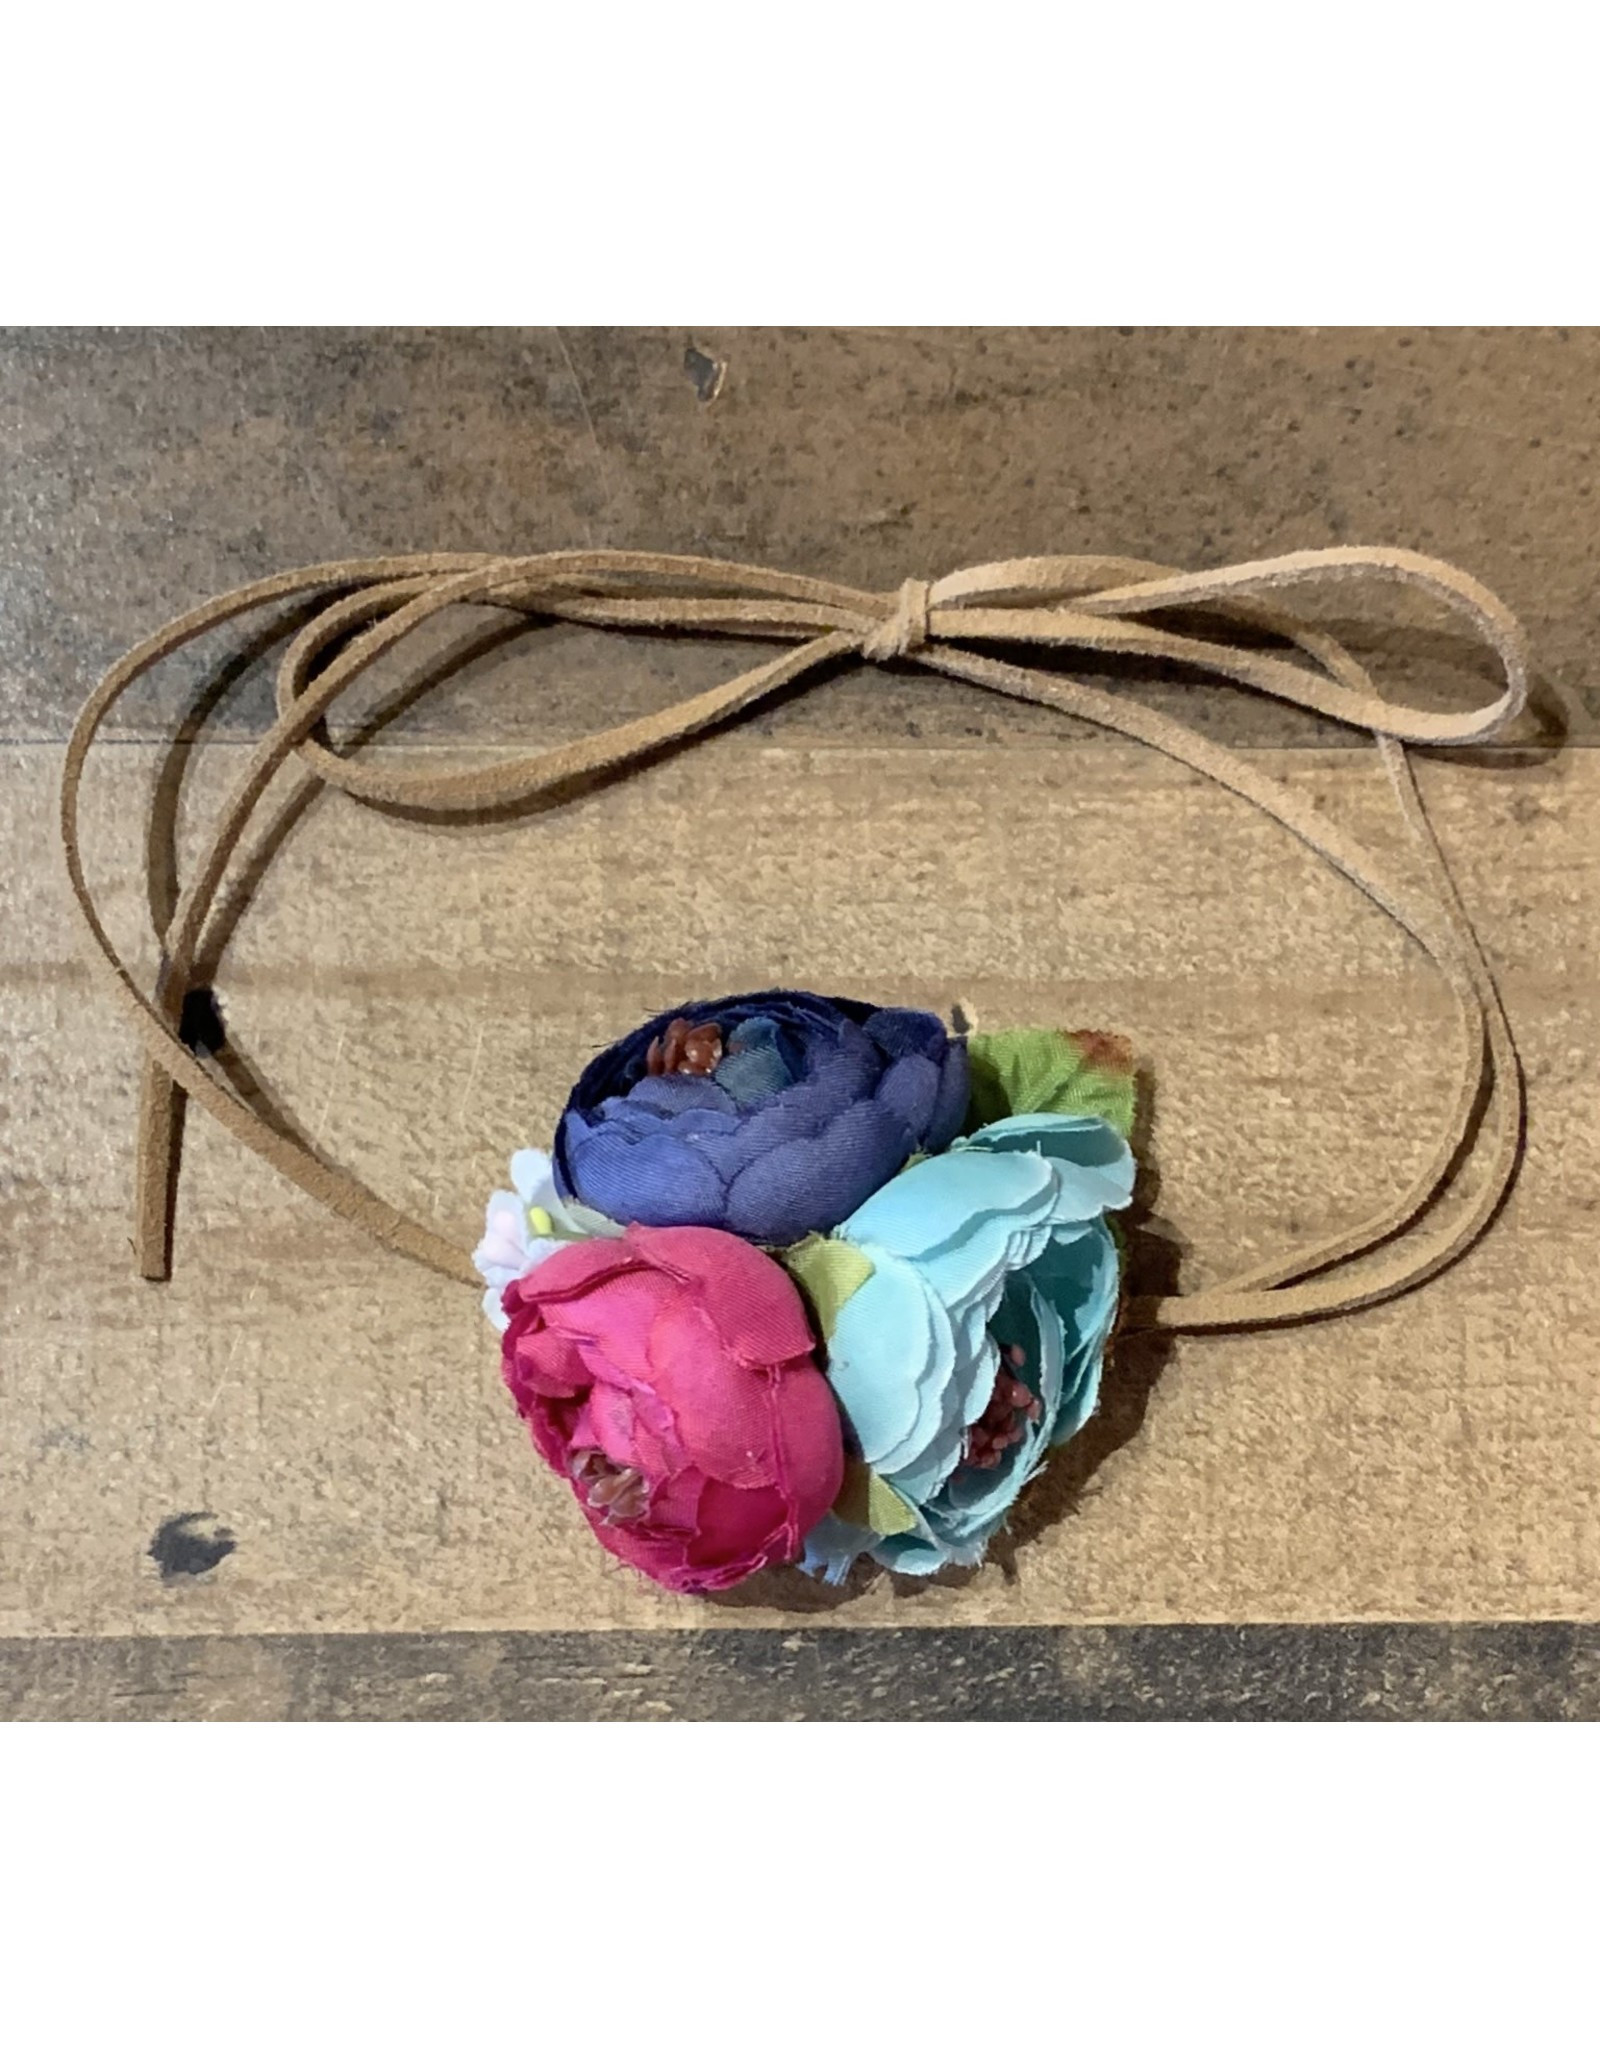 Baileys Blossoms Bailey's Blossoms- Shabby Floral Tie Back Headband